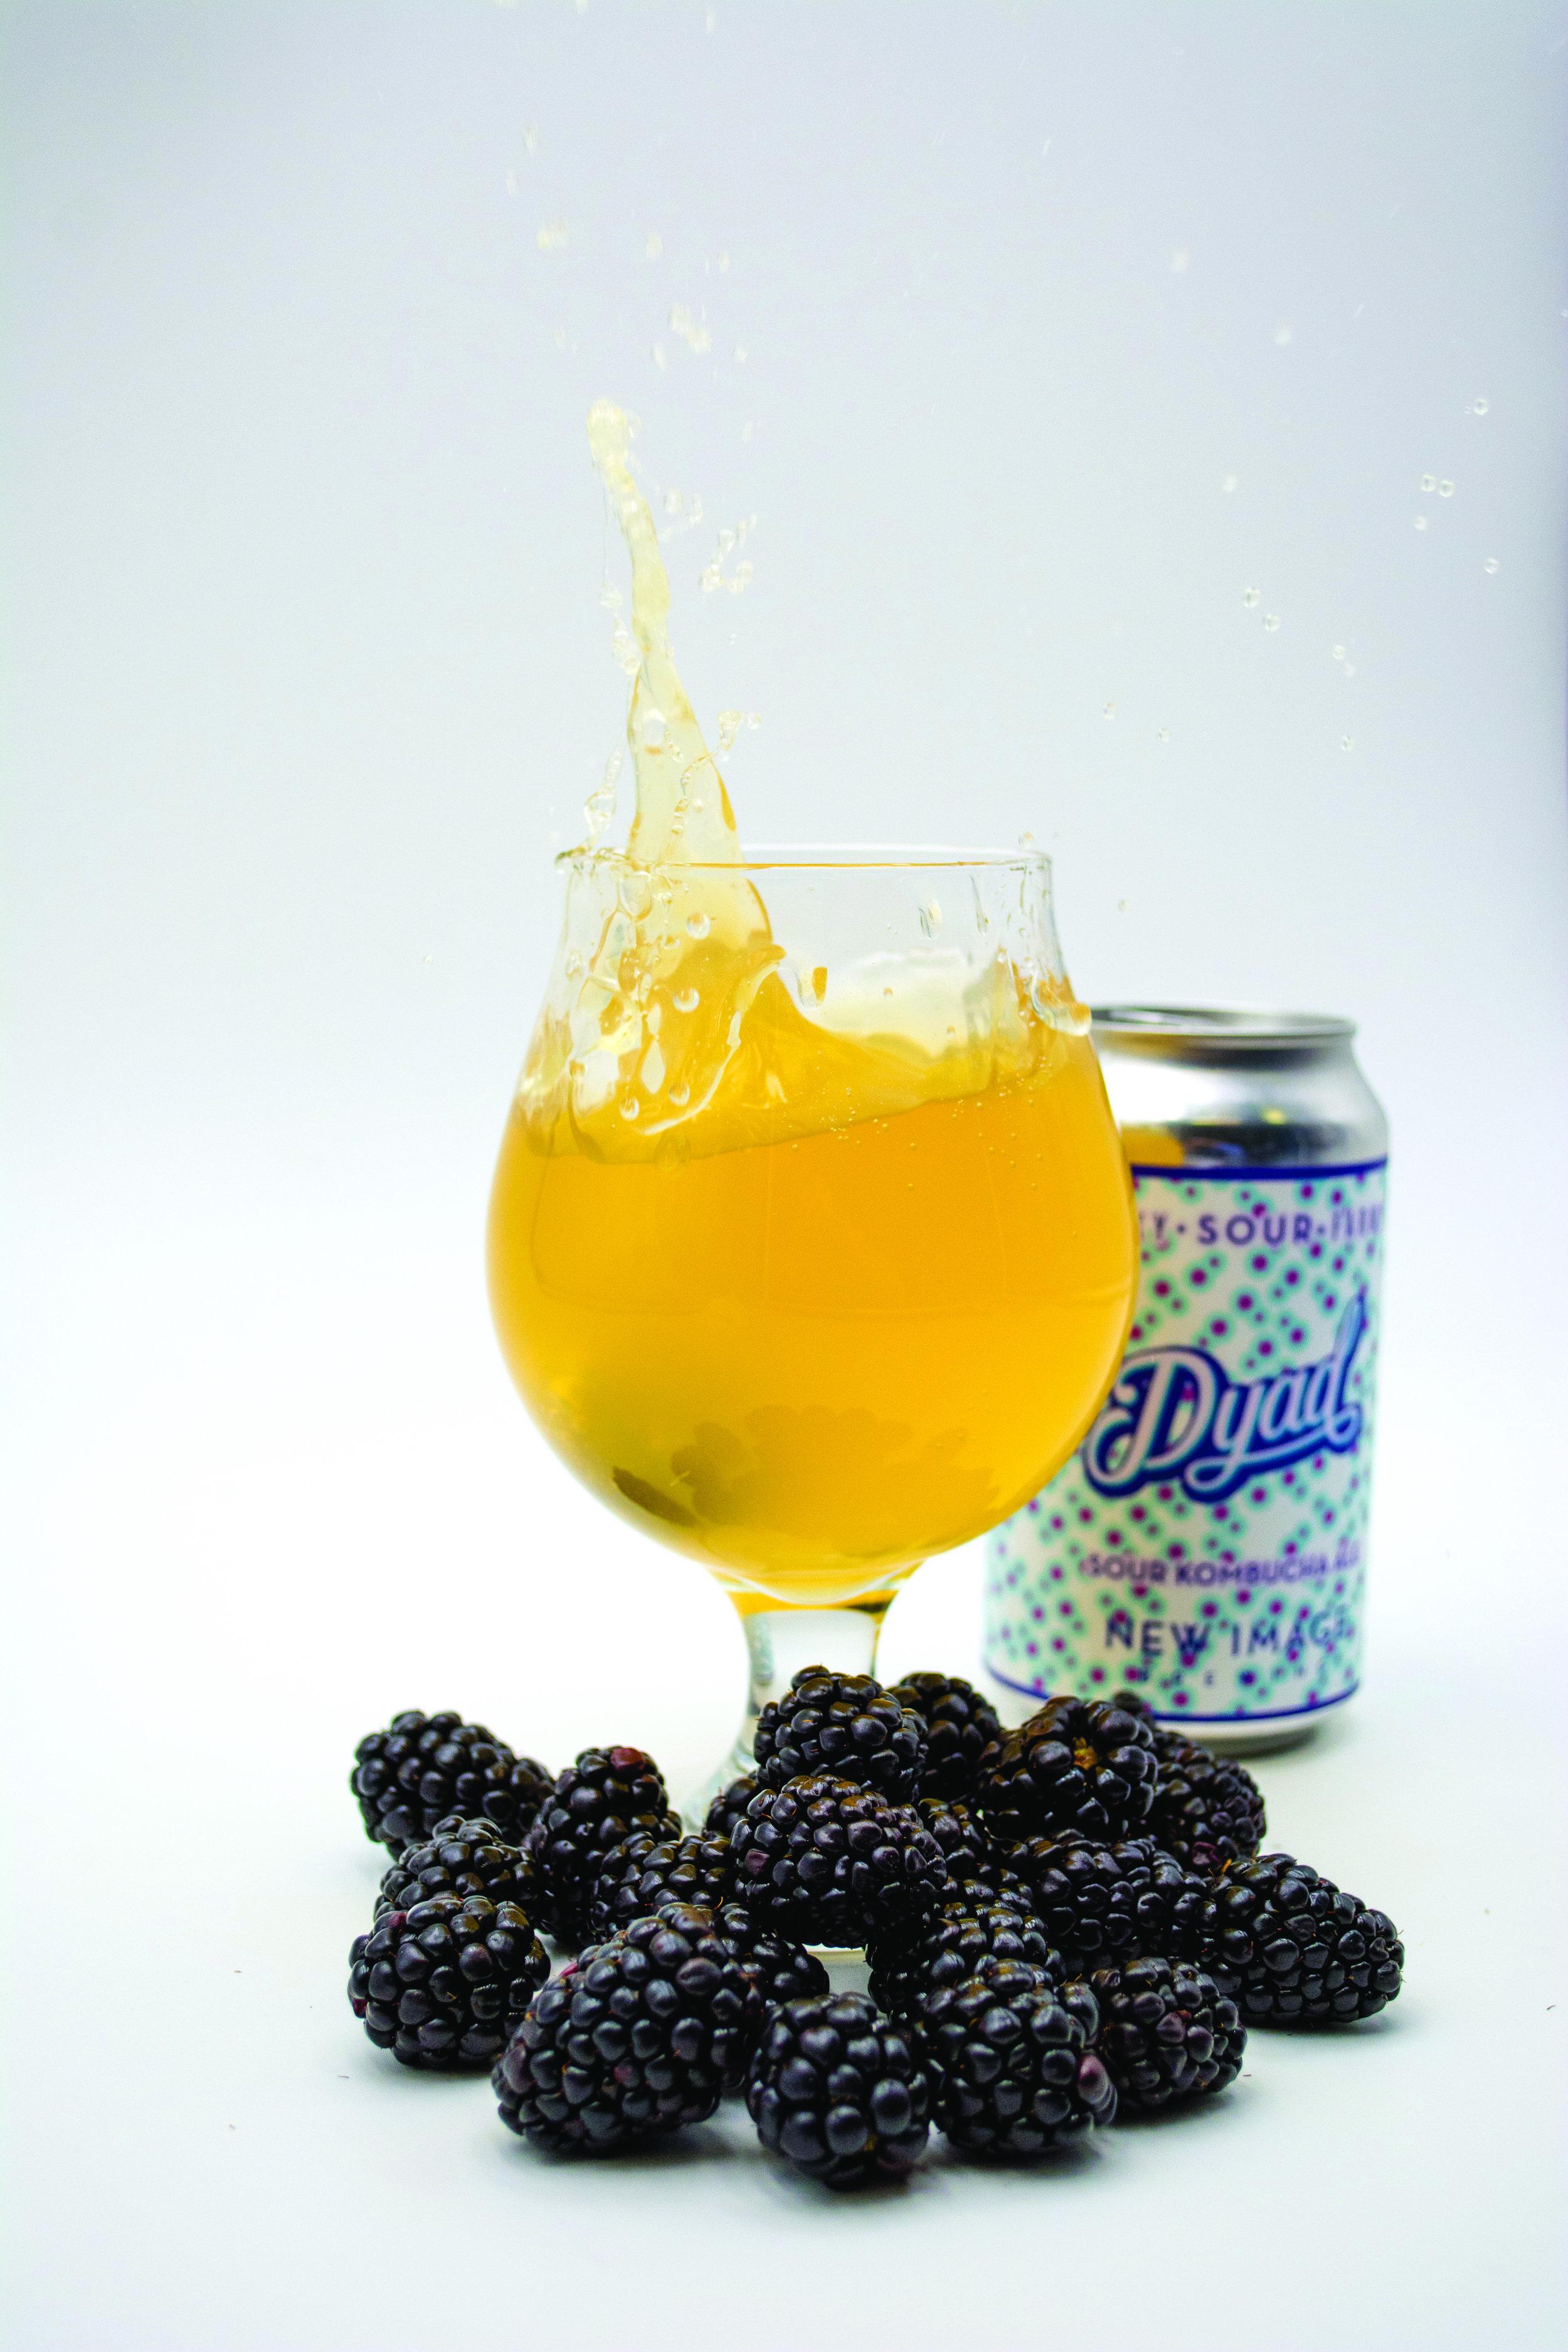 Dyad Style: Kombucha Brett Saison Brewery: New Image Brewing Location: Arvada ABV: 7.5 percent IBU: 0  Photo: Neill Pieper